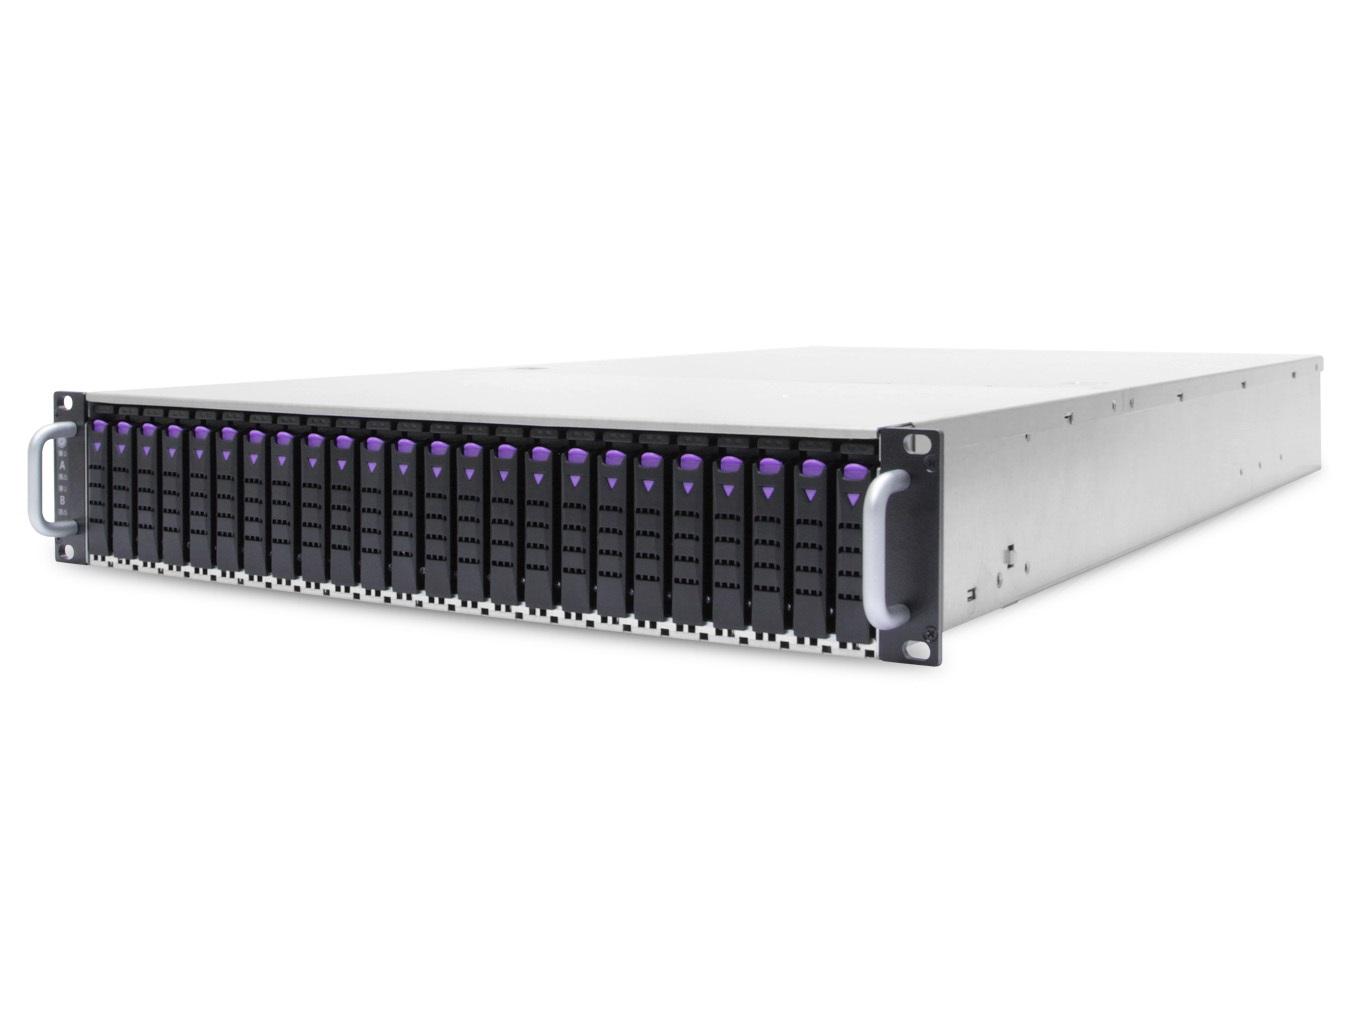 AIC HA202-PH XP1-A202PH03 2U 24-Bay NVMe Storage Server